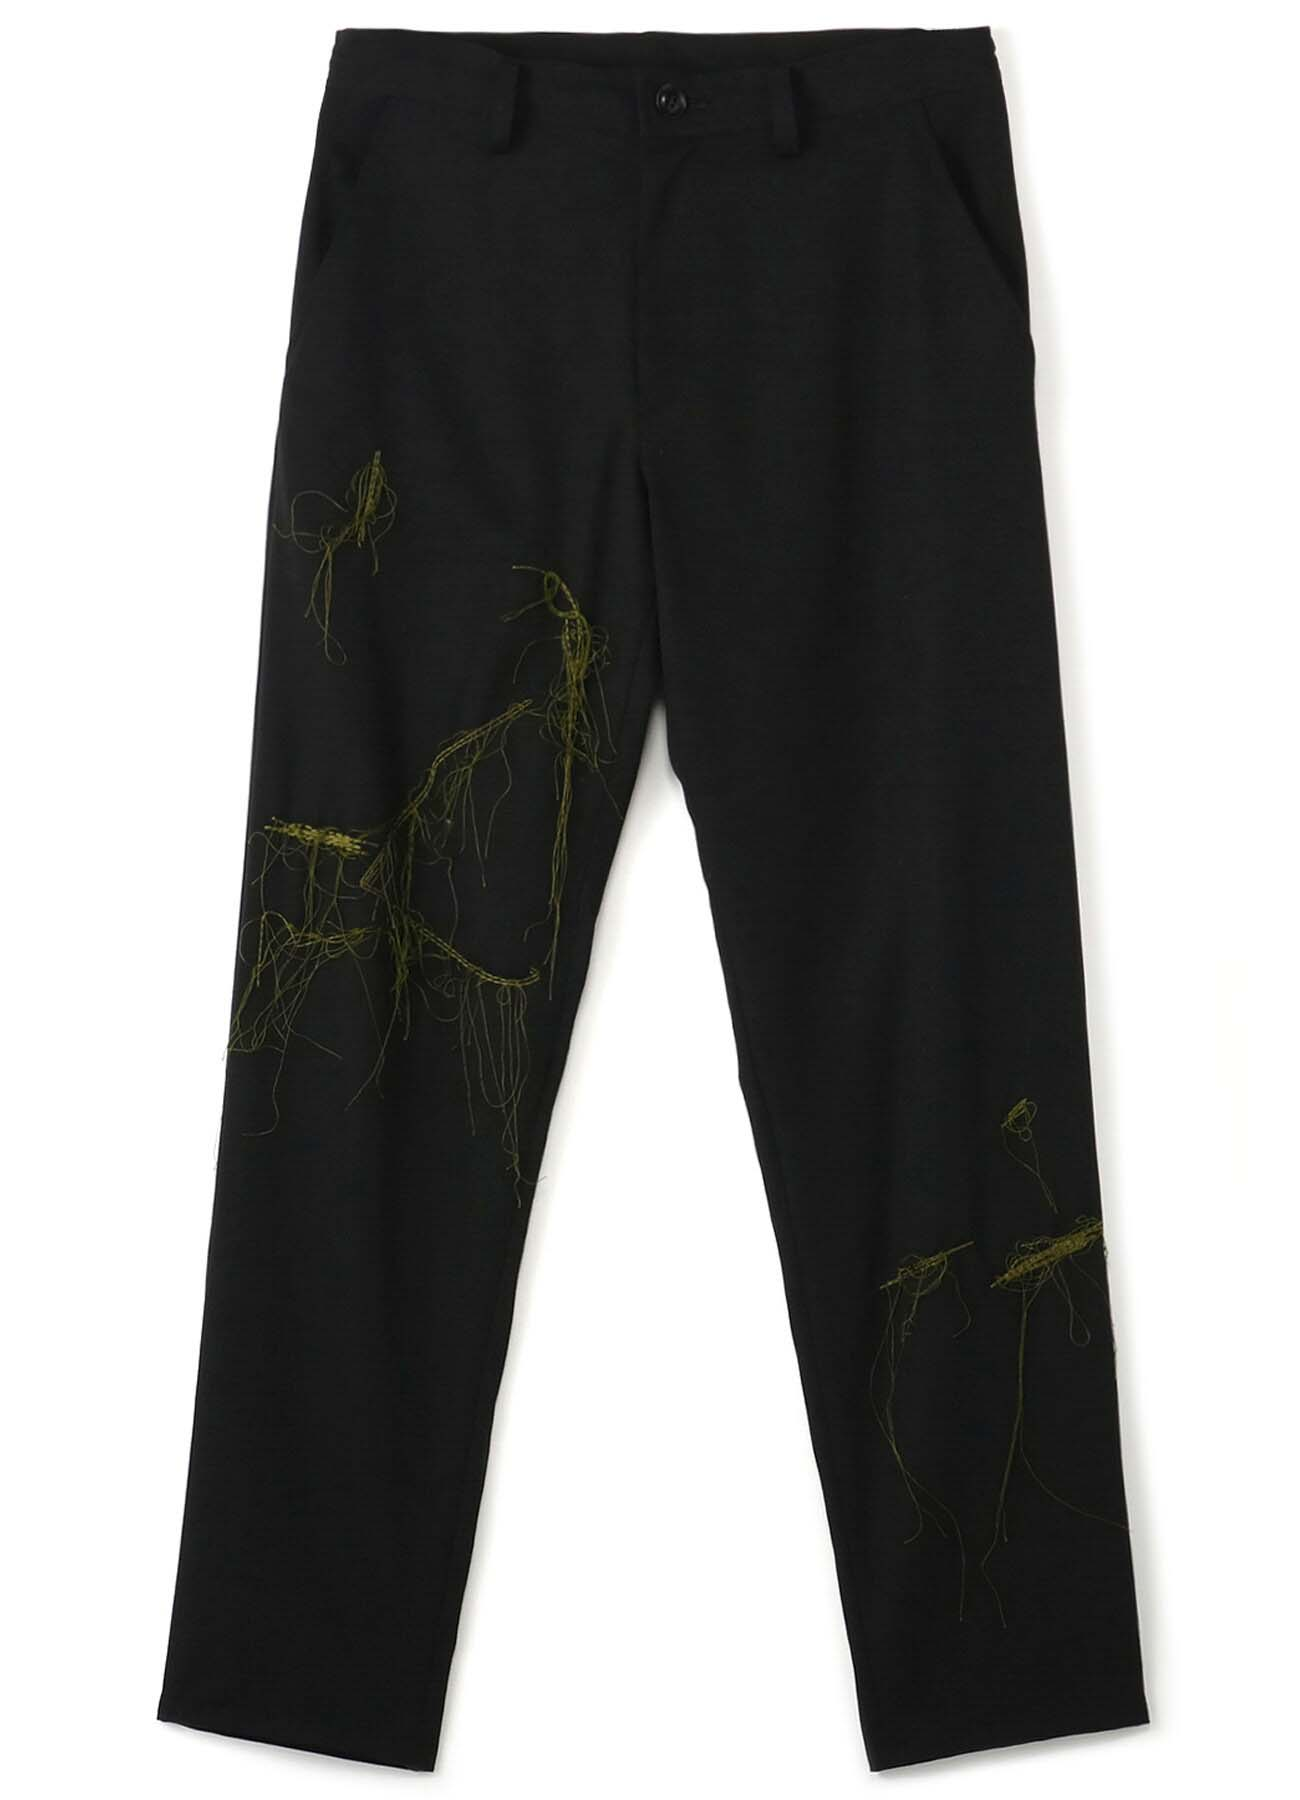 GABARDINE WAIST STRING THIN PANTS